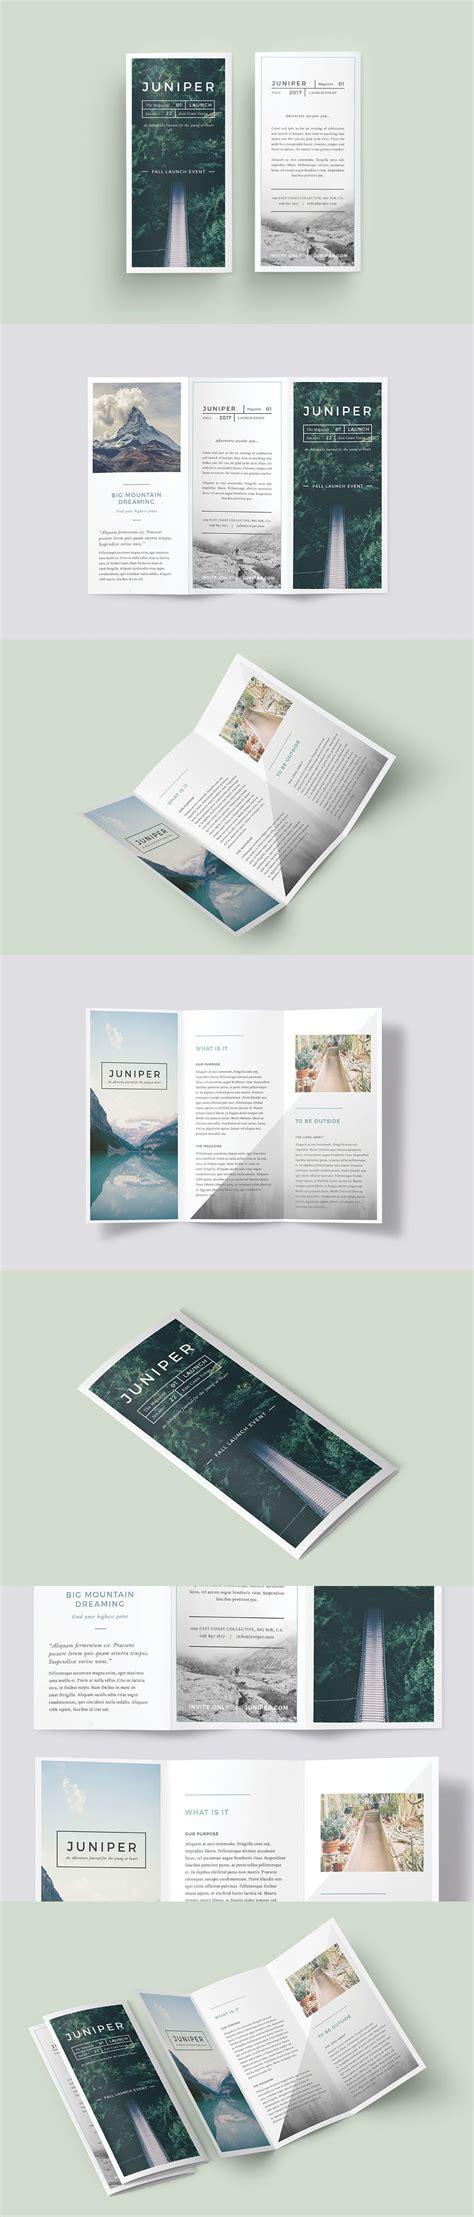 Tri Fold Brochure Template Indesign Free Gallery Indesign Tri Fold Brochure Template Images Gallery